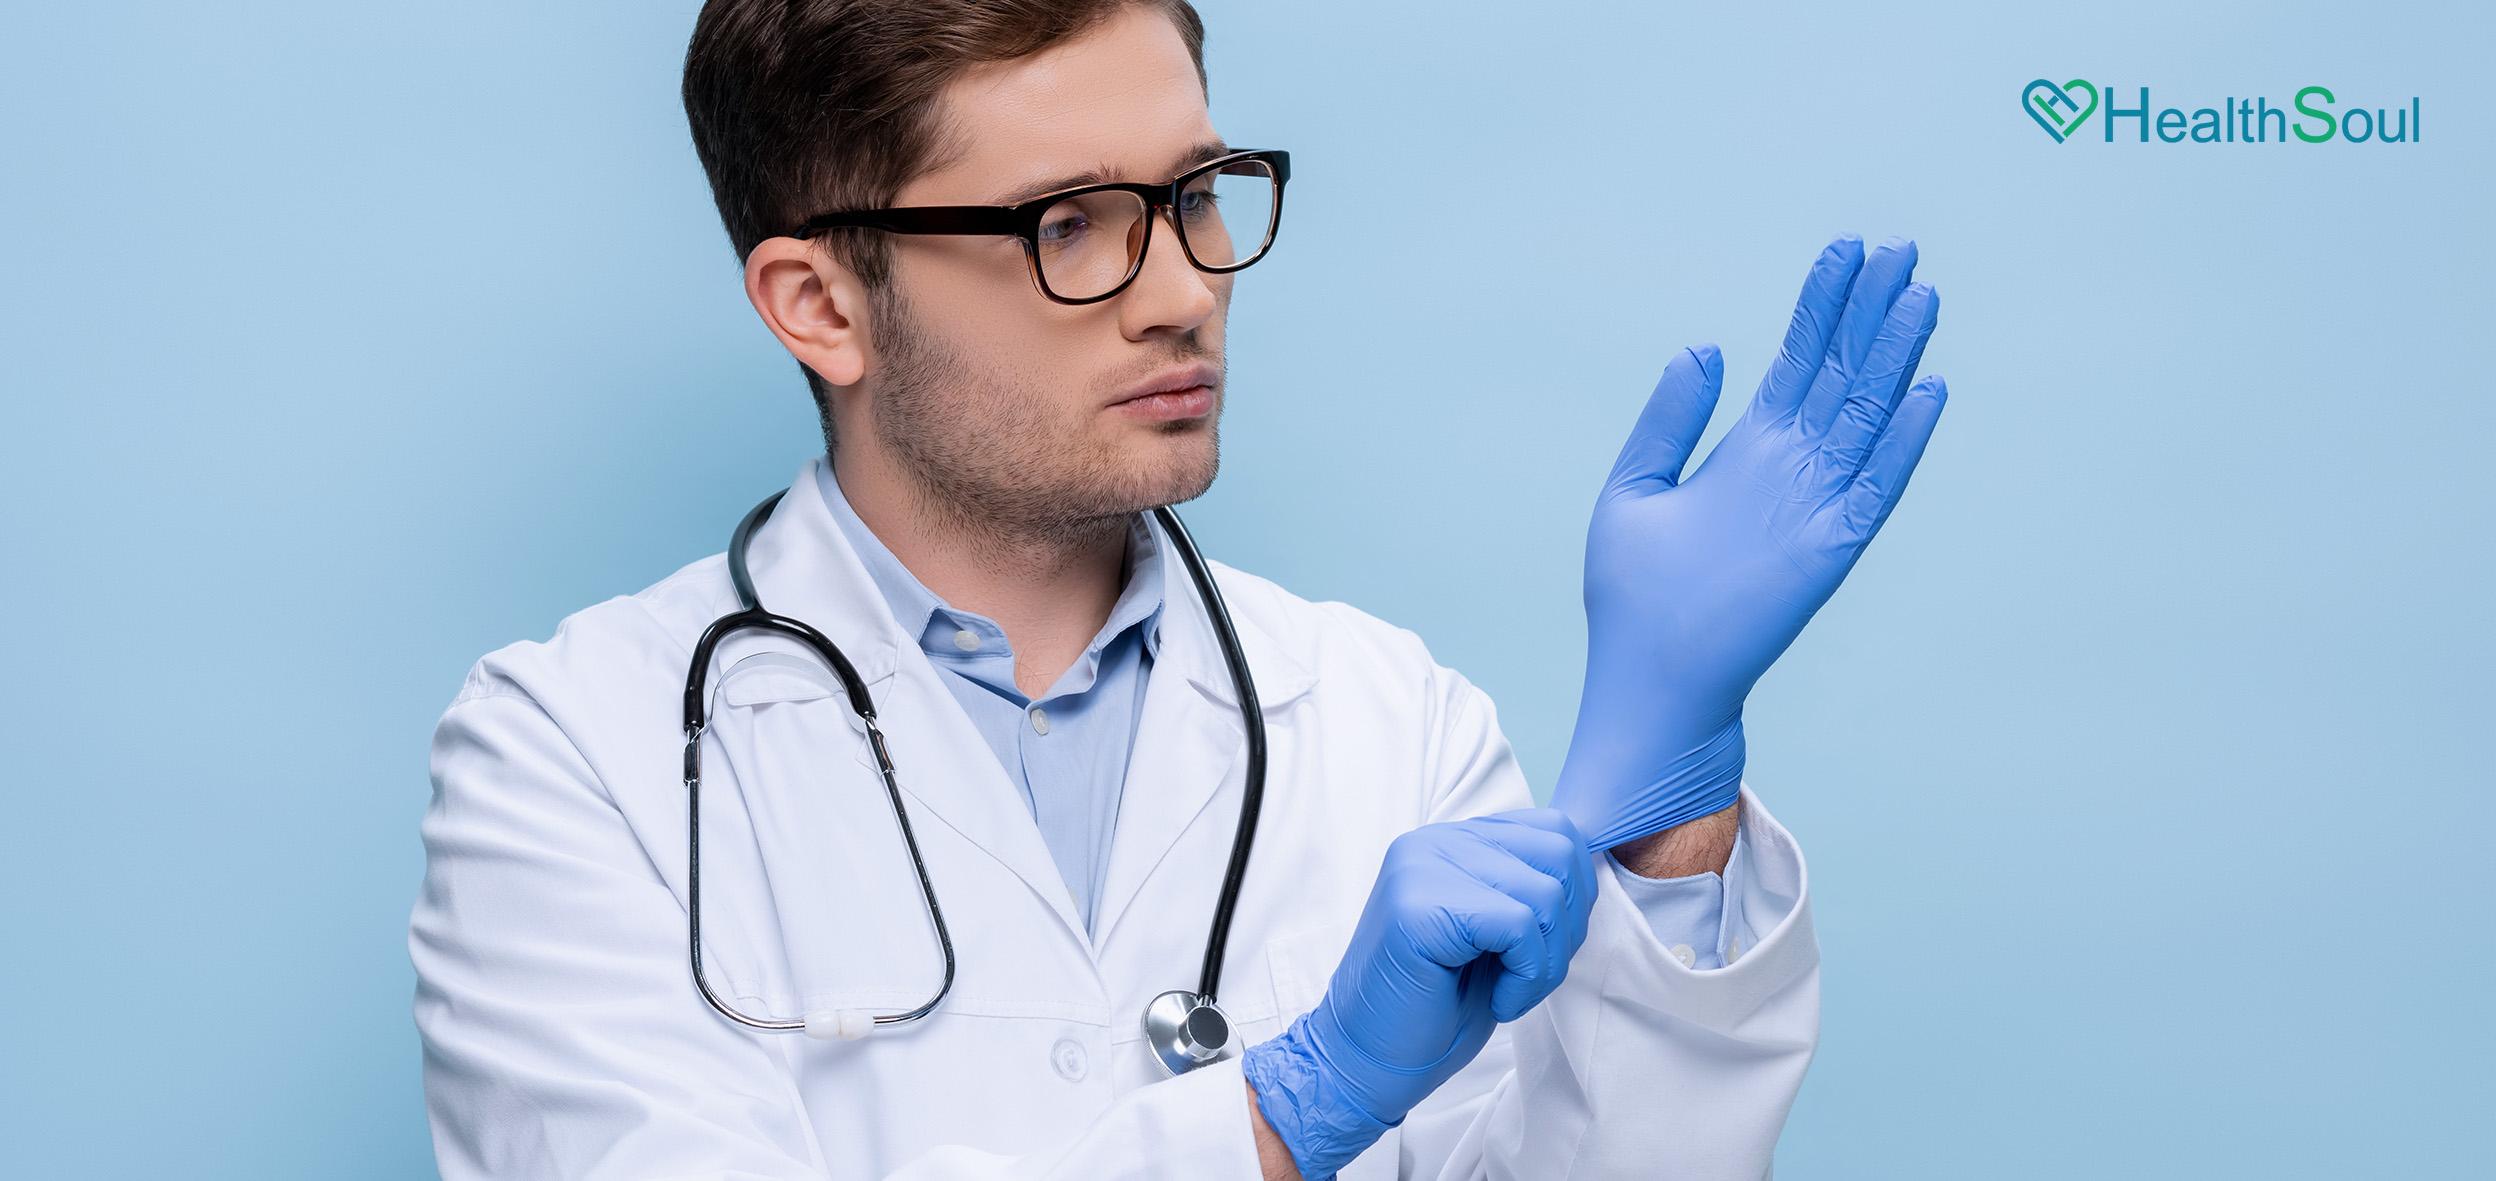 Vinyl Vs Nitrile Vs Latex Gloves: How Do They Differ? | HealthSoul